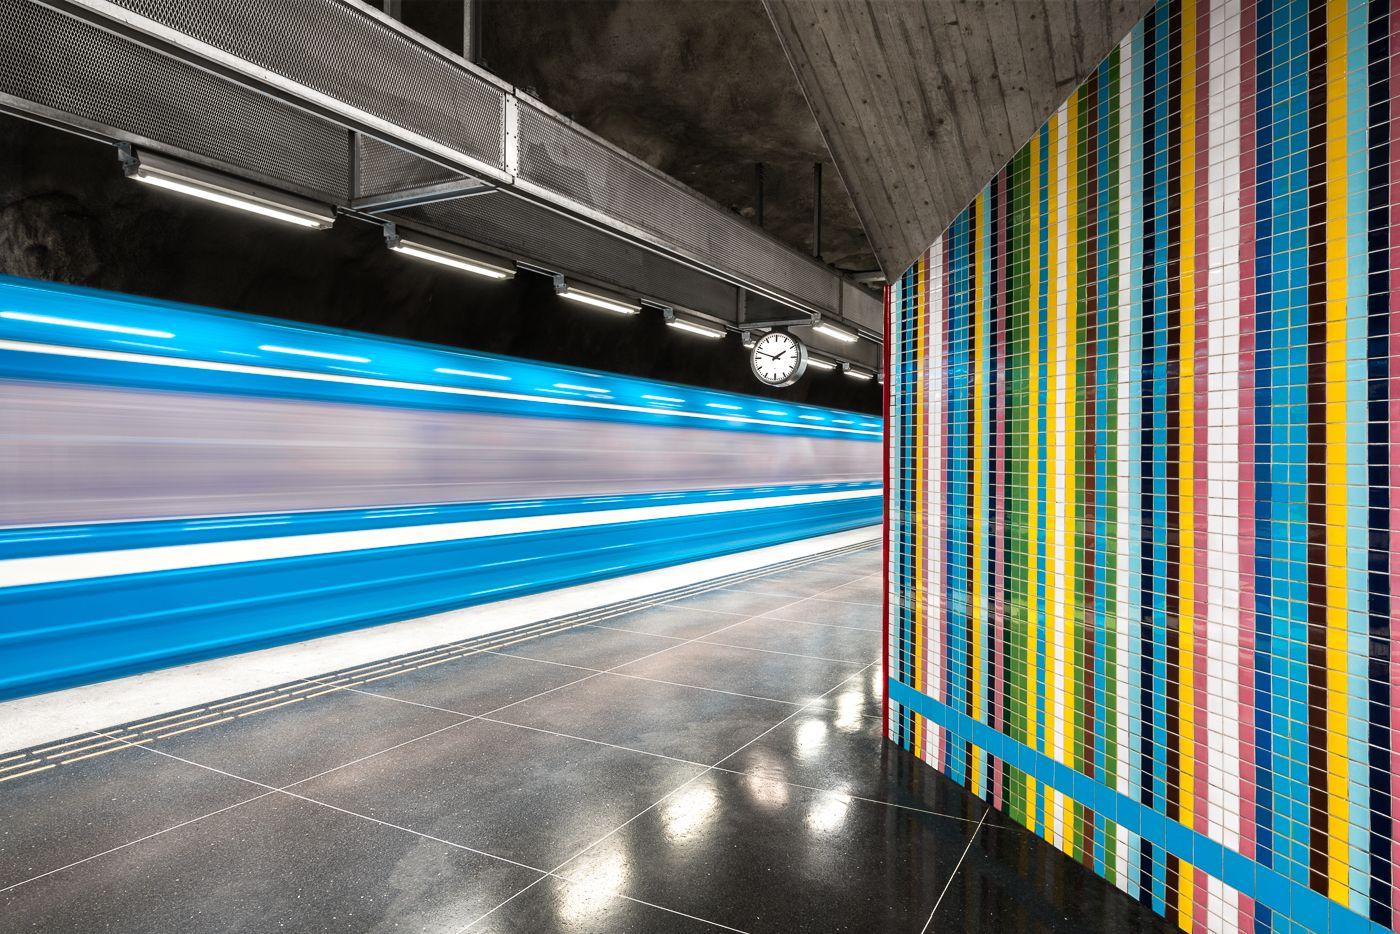 Västra Skogen Stockholm Urban Pinterest Photographers And - Vibrant photos of international subways capture their unappreciated beauty